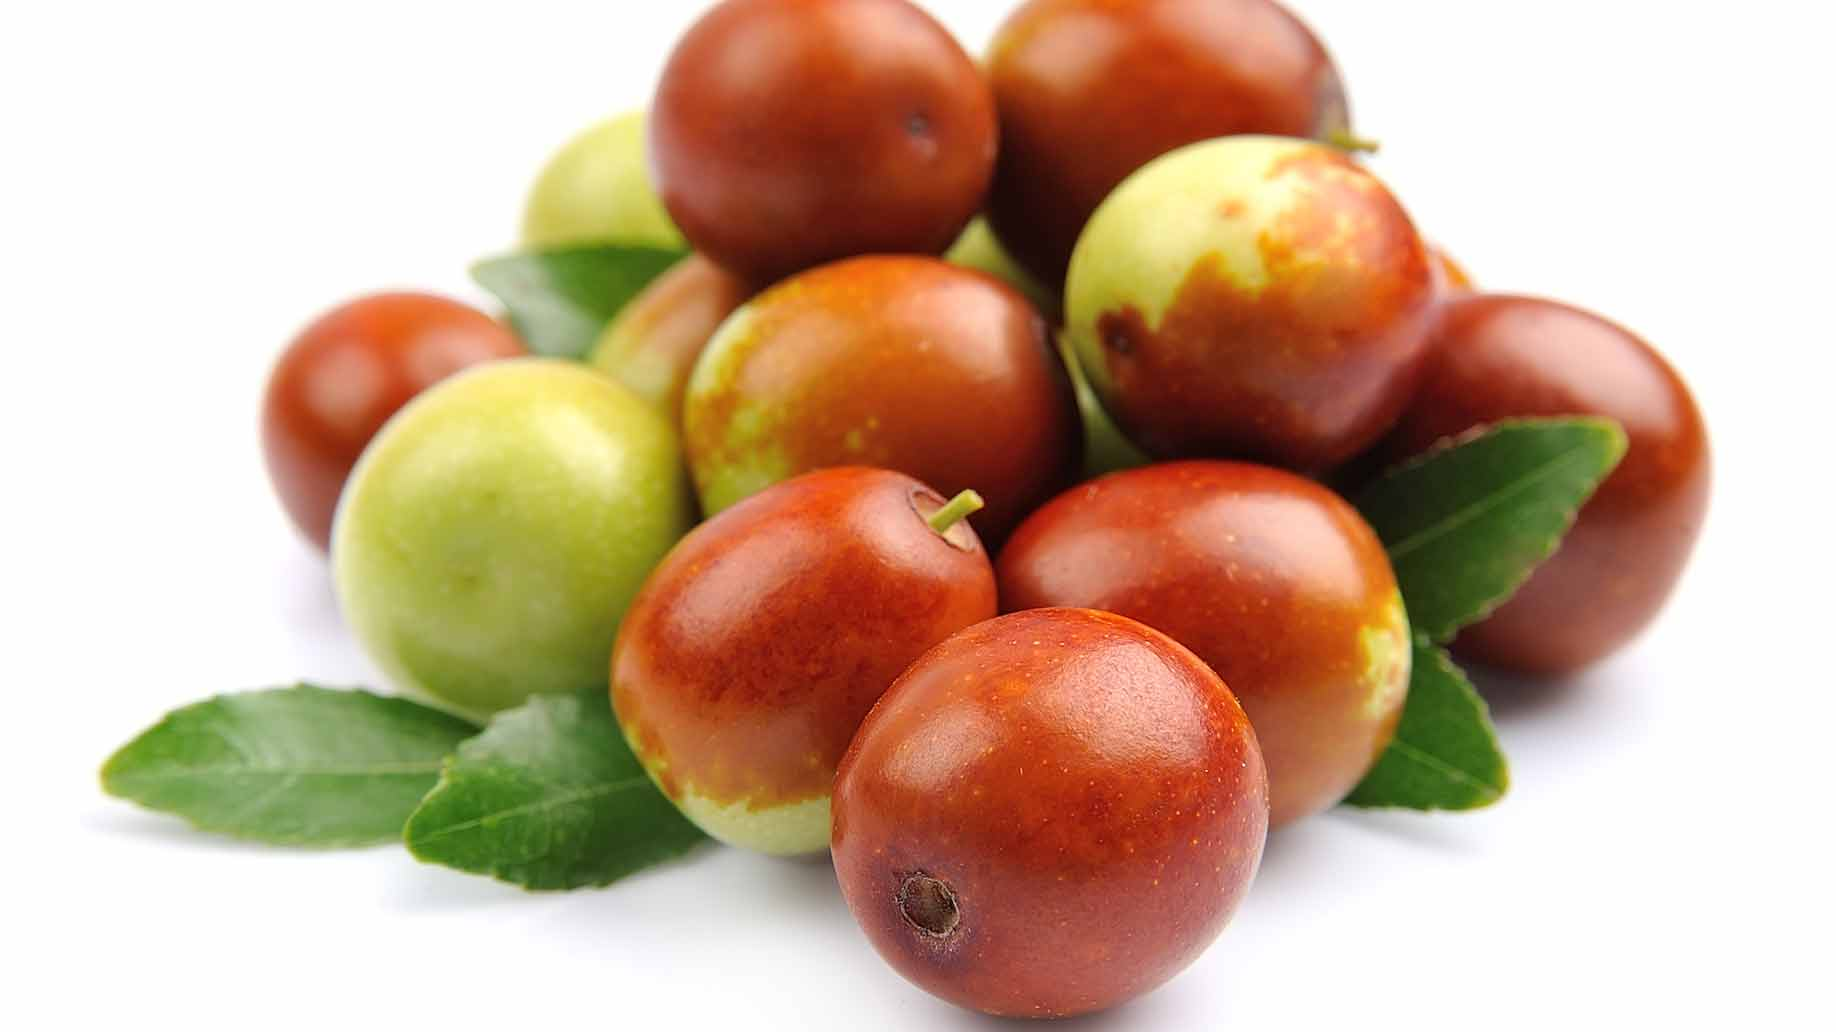 jojoba fruit oil wound healing collagen acne natural health benefits remedies